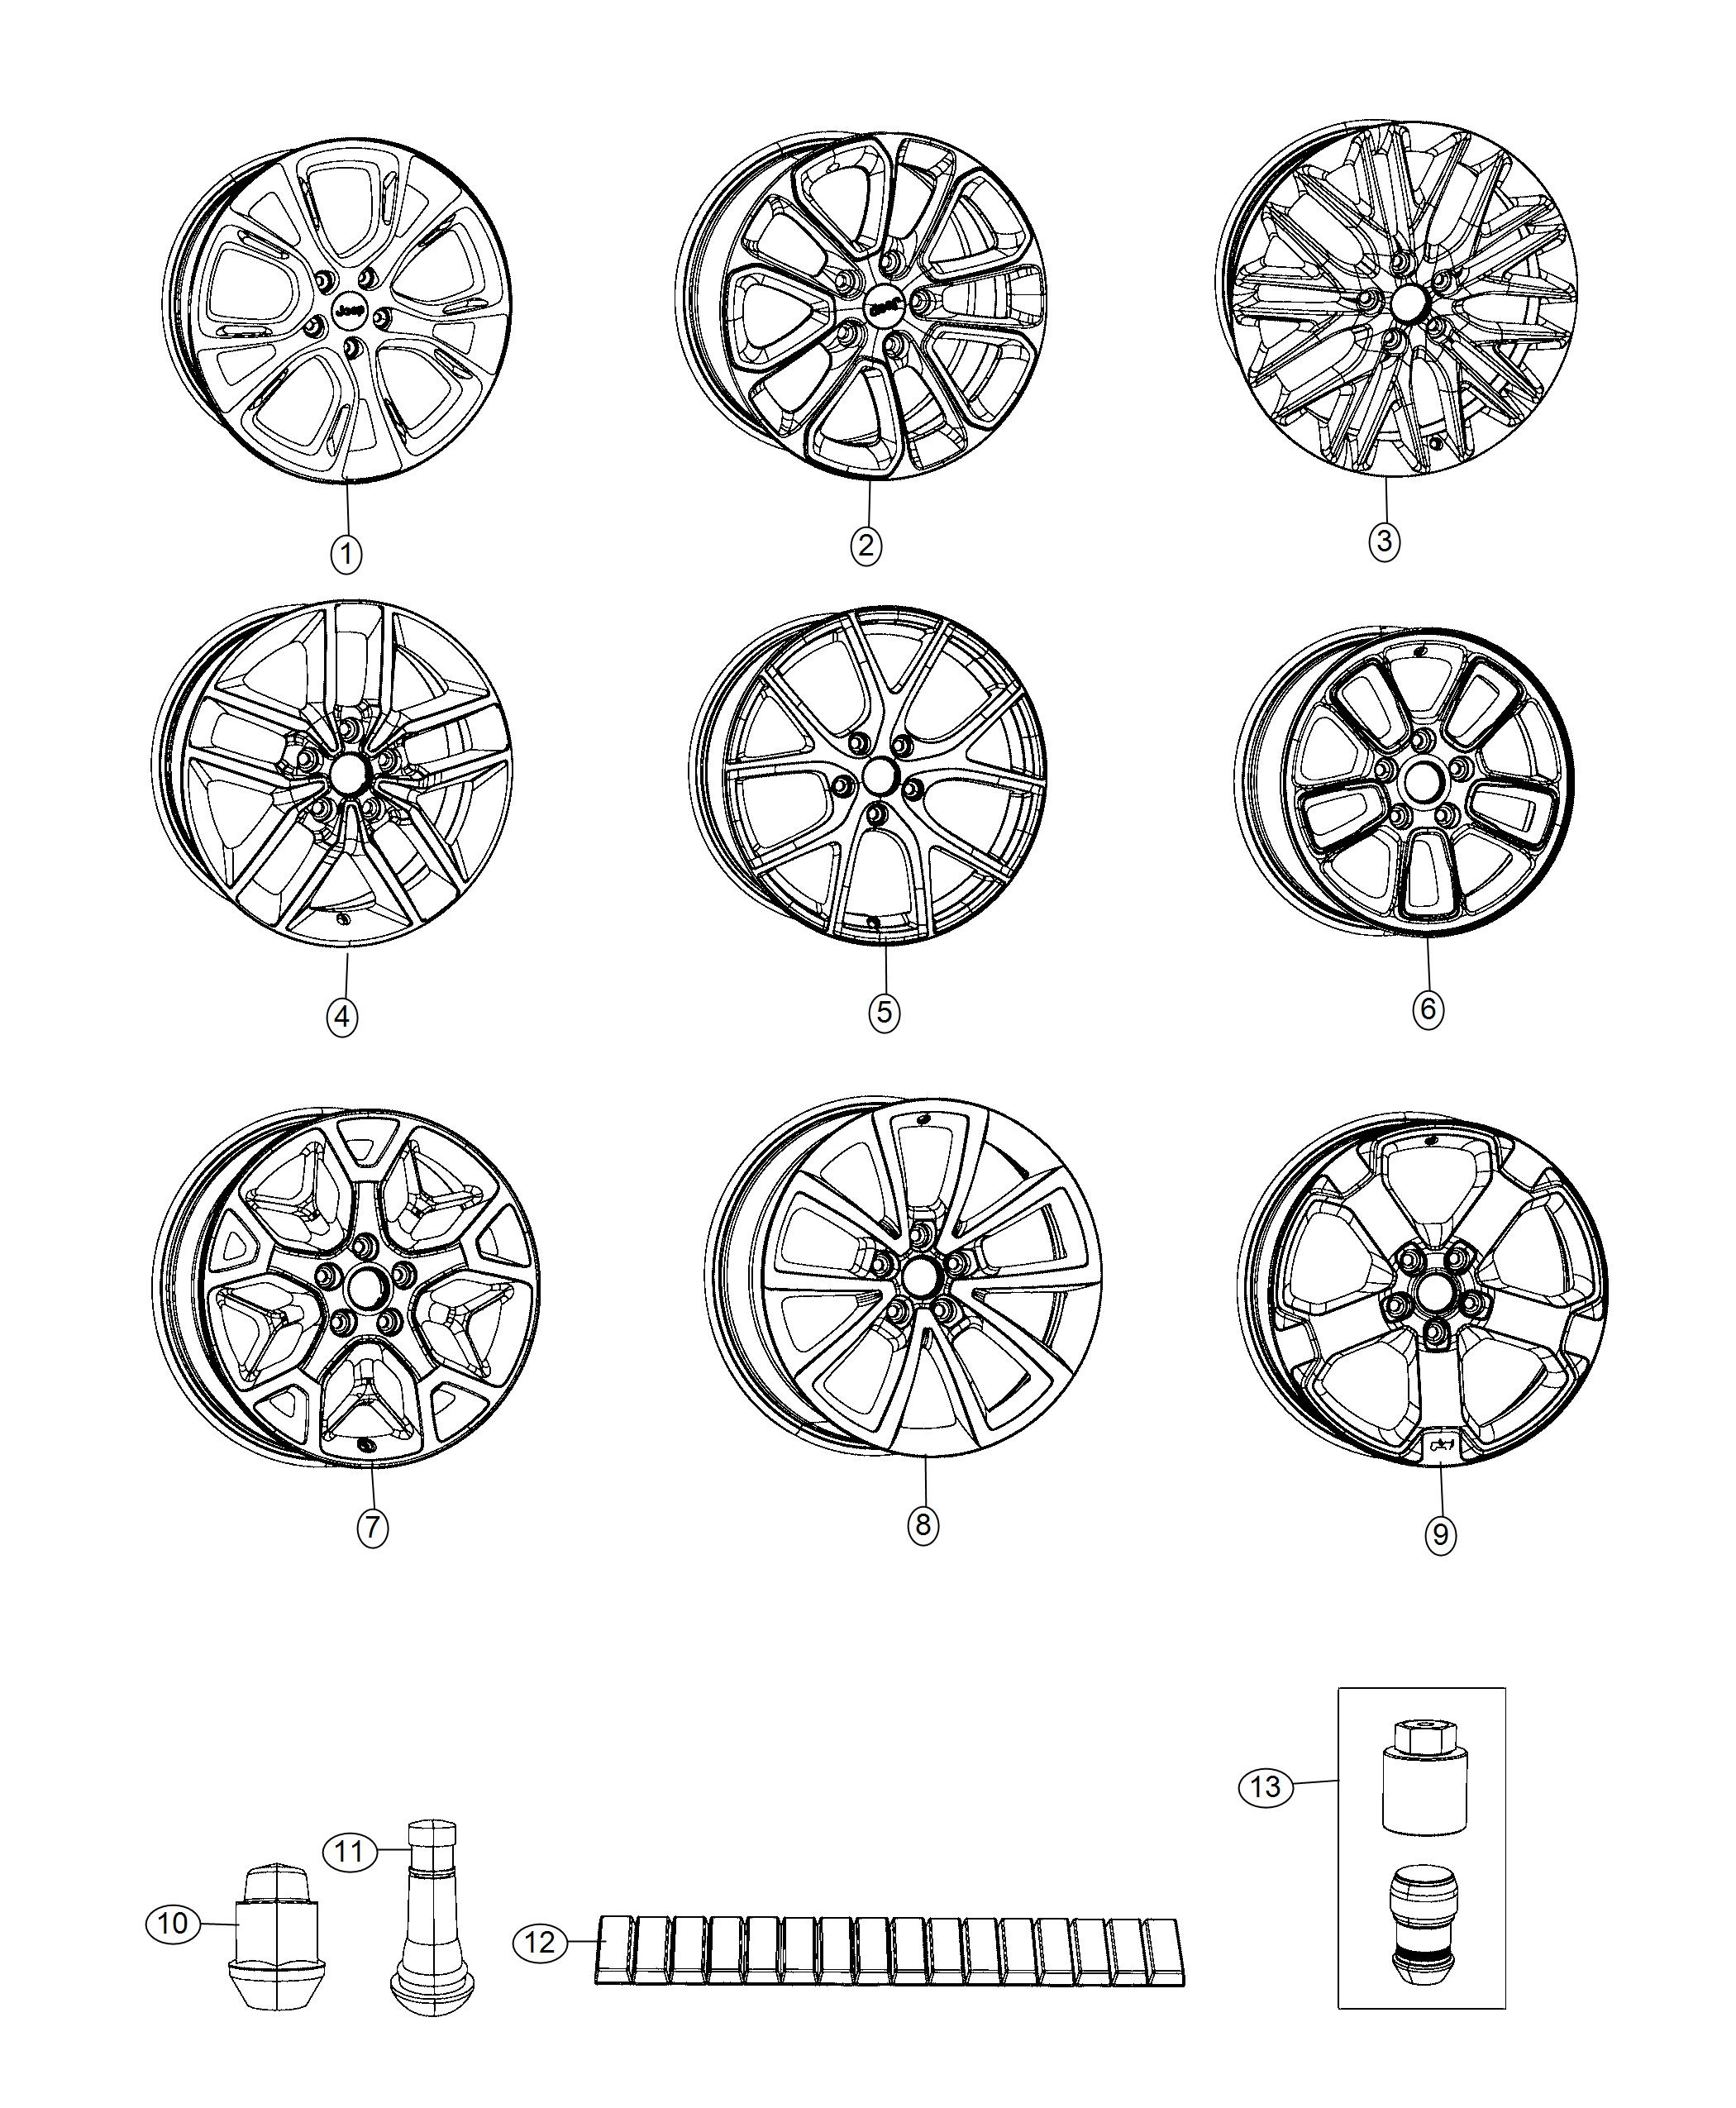 2018 Jeep Grand Cherokee Wheel. Aluminum. Front or rear